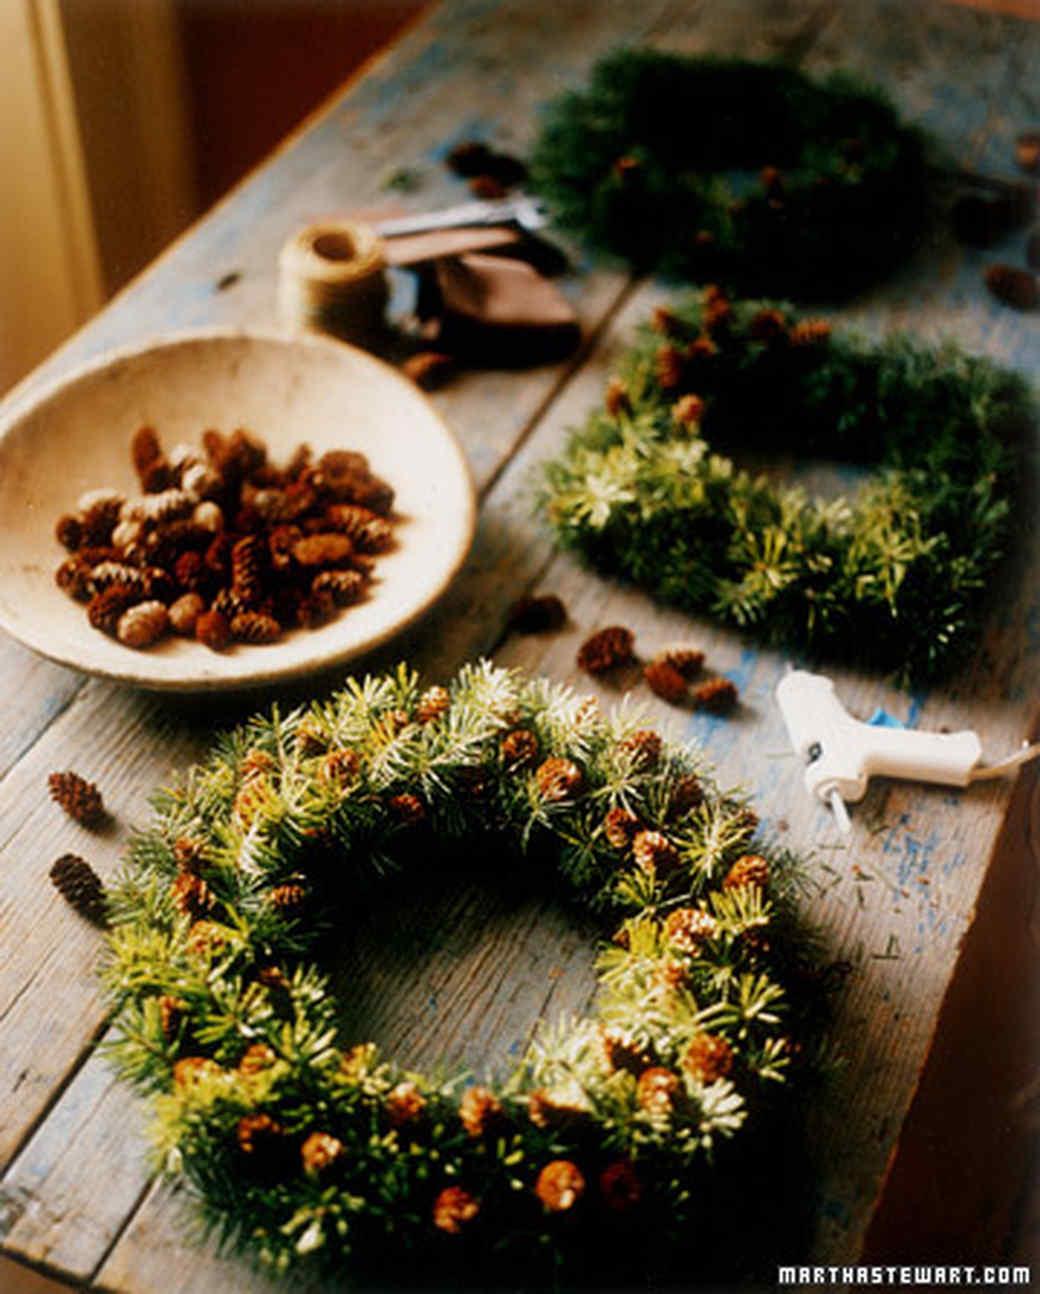 Pinecone-Studded Wreath